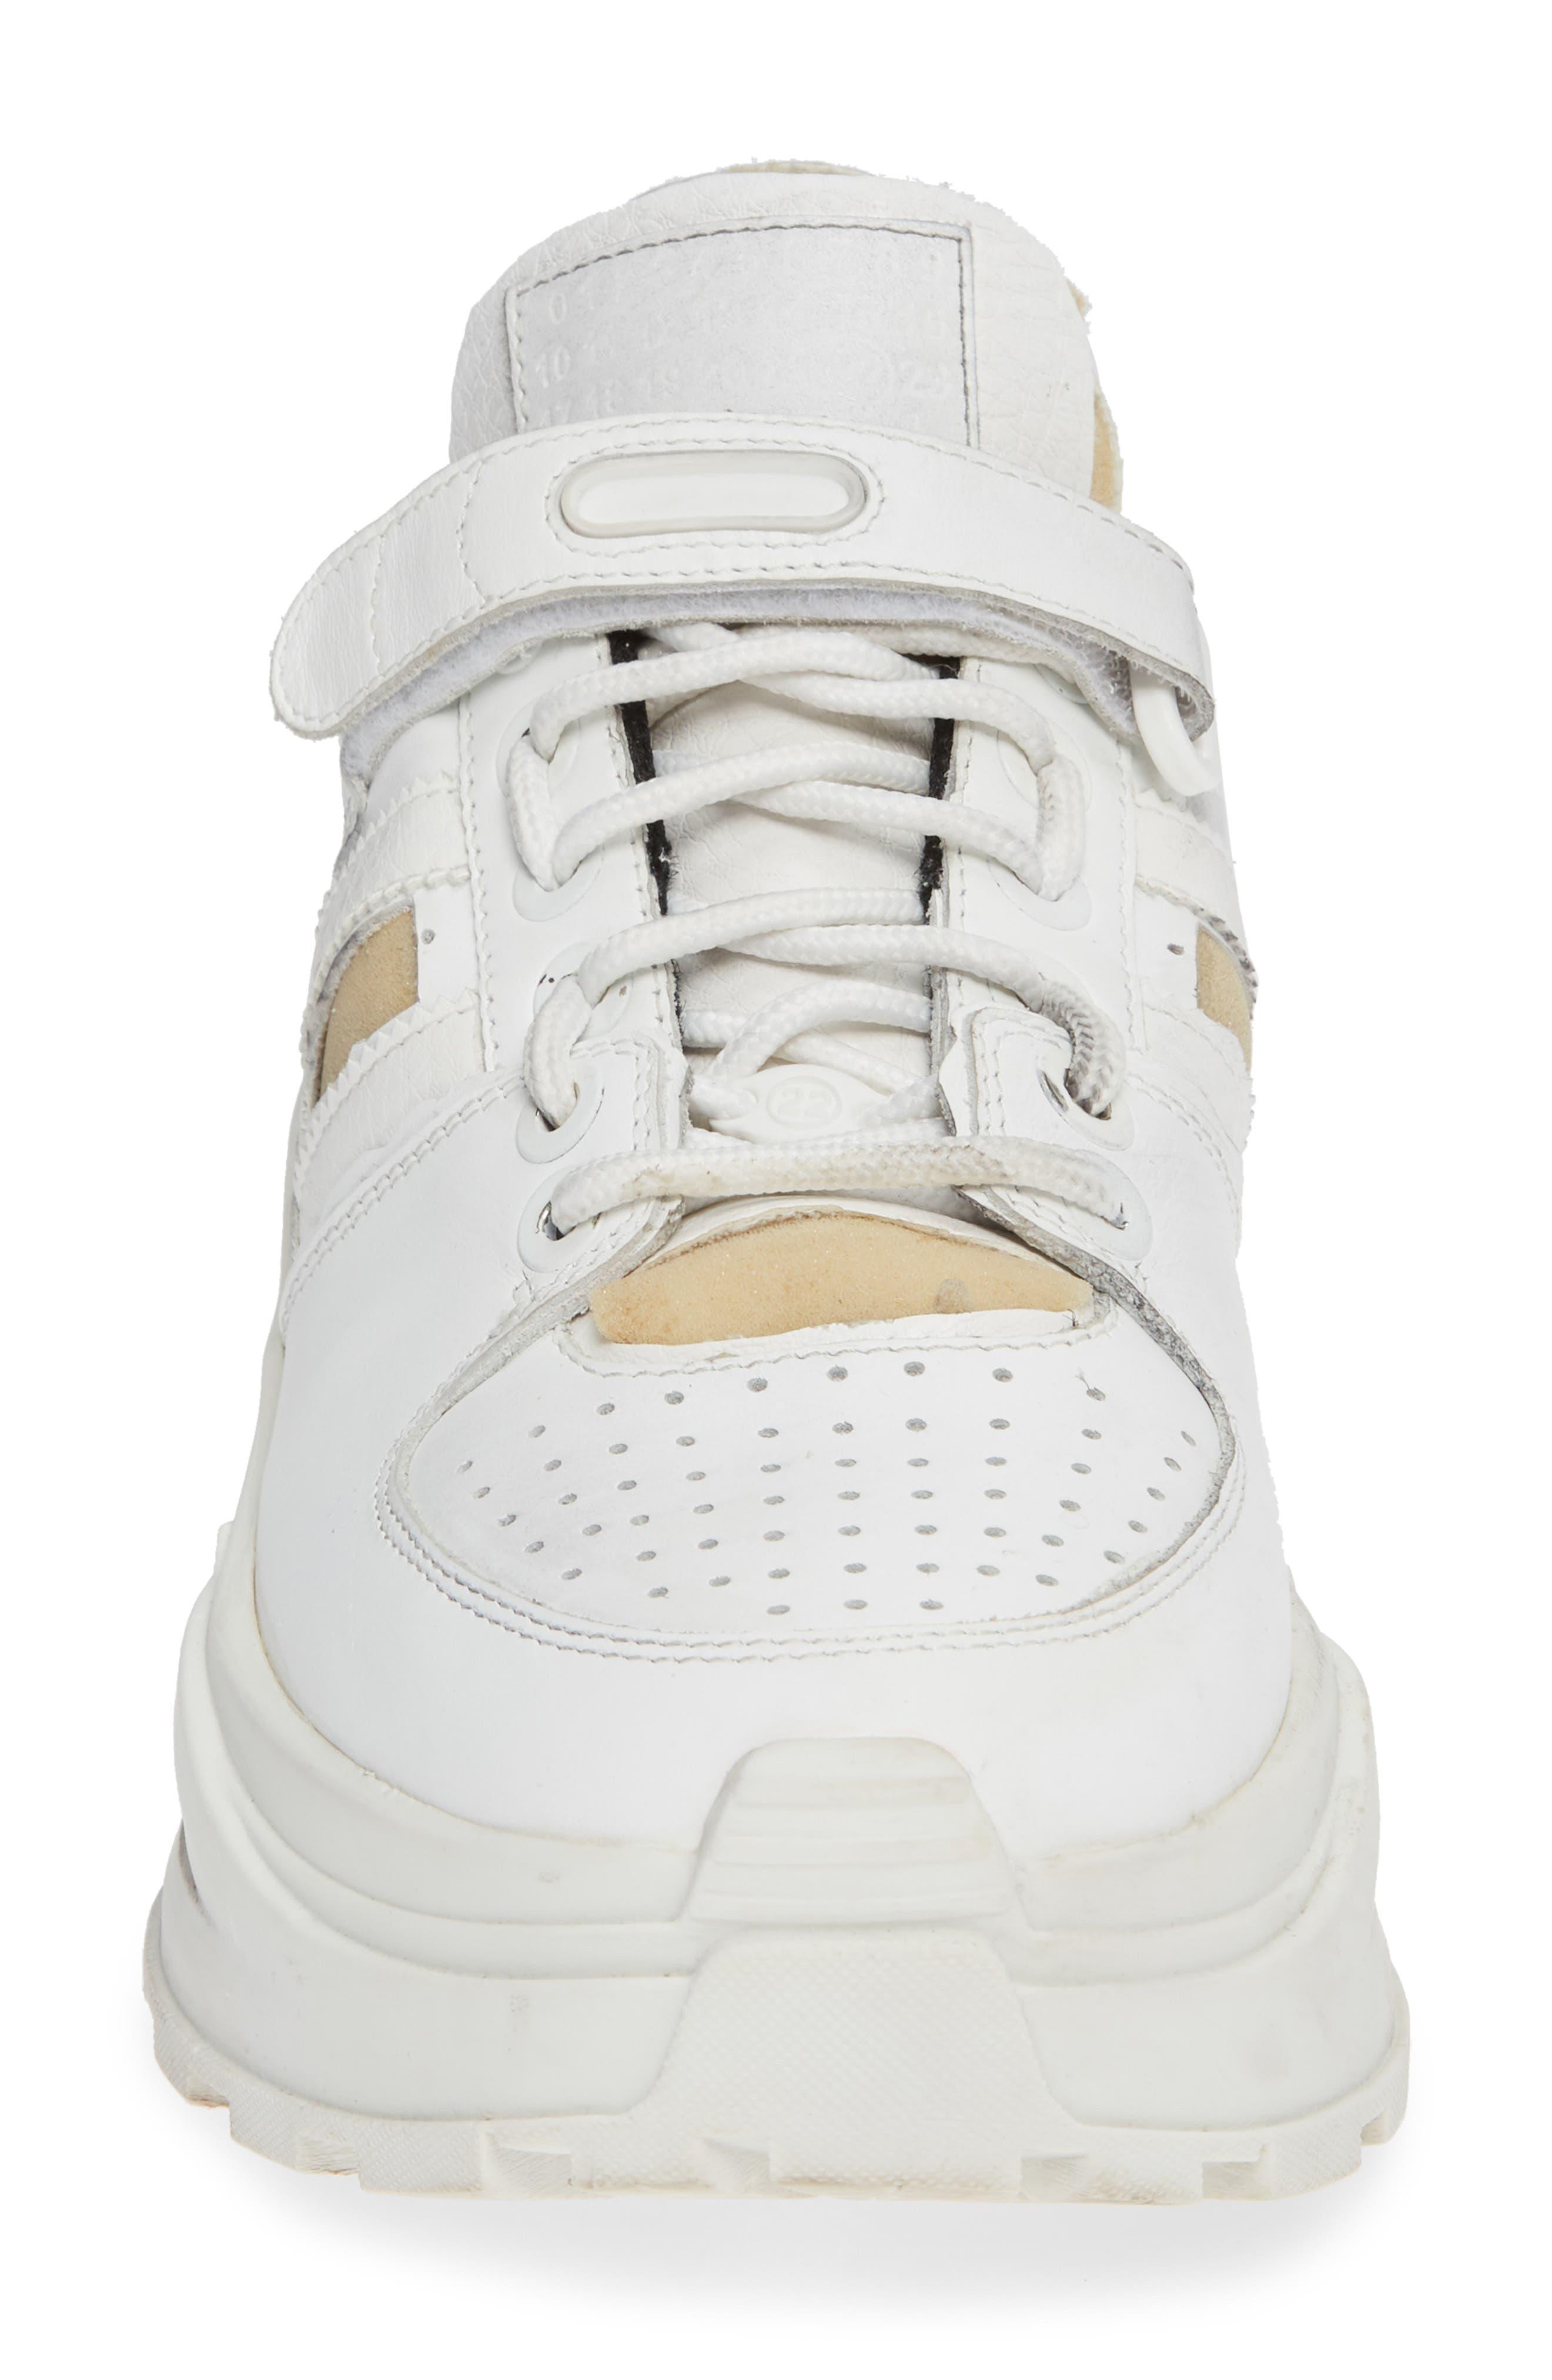 MAISON MARGIELA, Retro Fit Destroyed Sneaker, Alternate thumbnail 4, color, WHITE